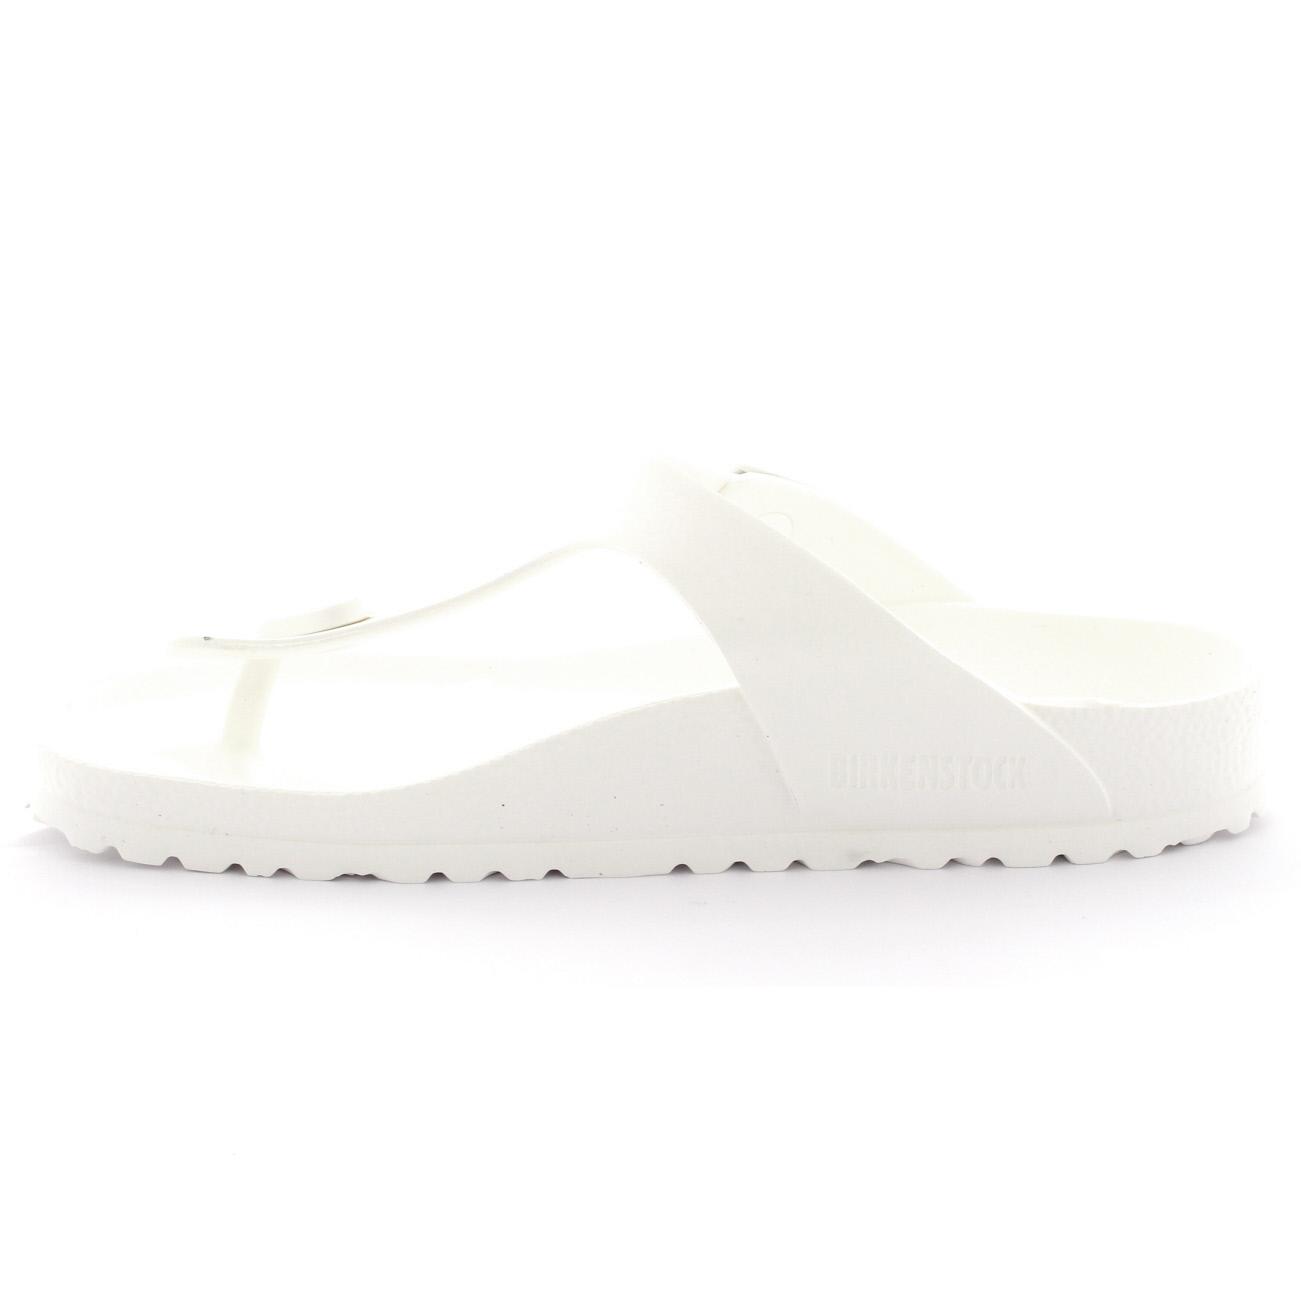 Unisex-Adults-Birkenstock-Gizeh-Summer-EVA-Toe-Post-Beach-Flat-Sandals-All-Sizes thumbnail 17